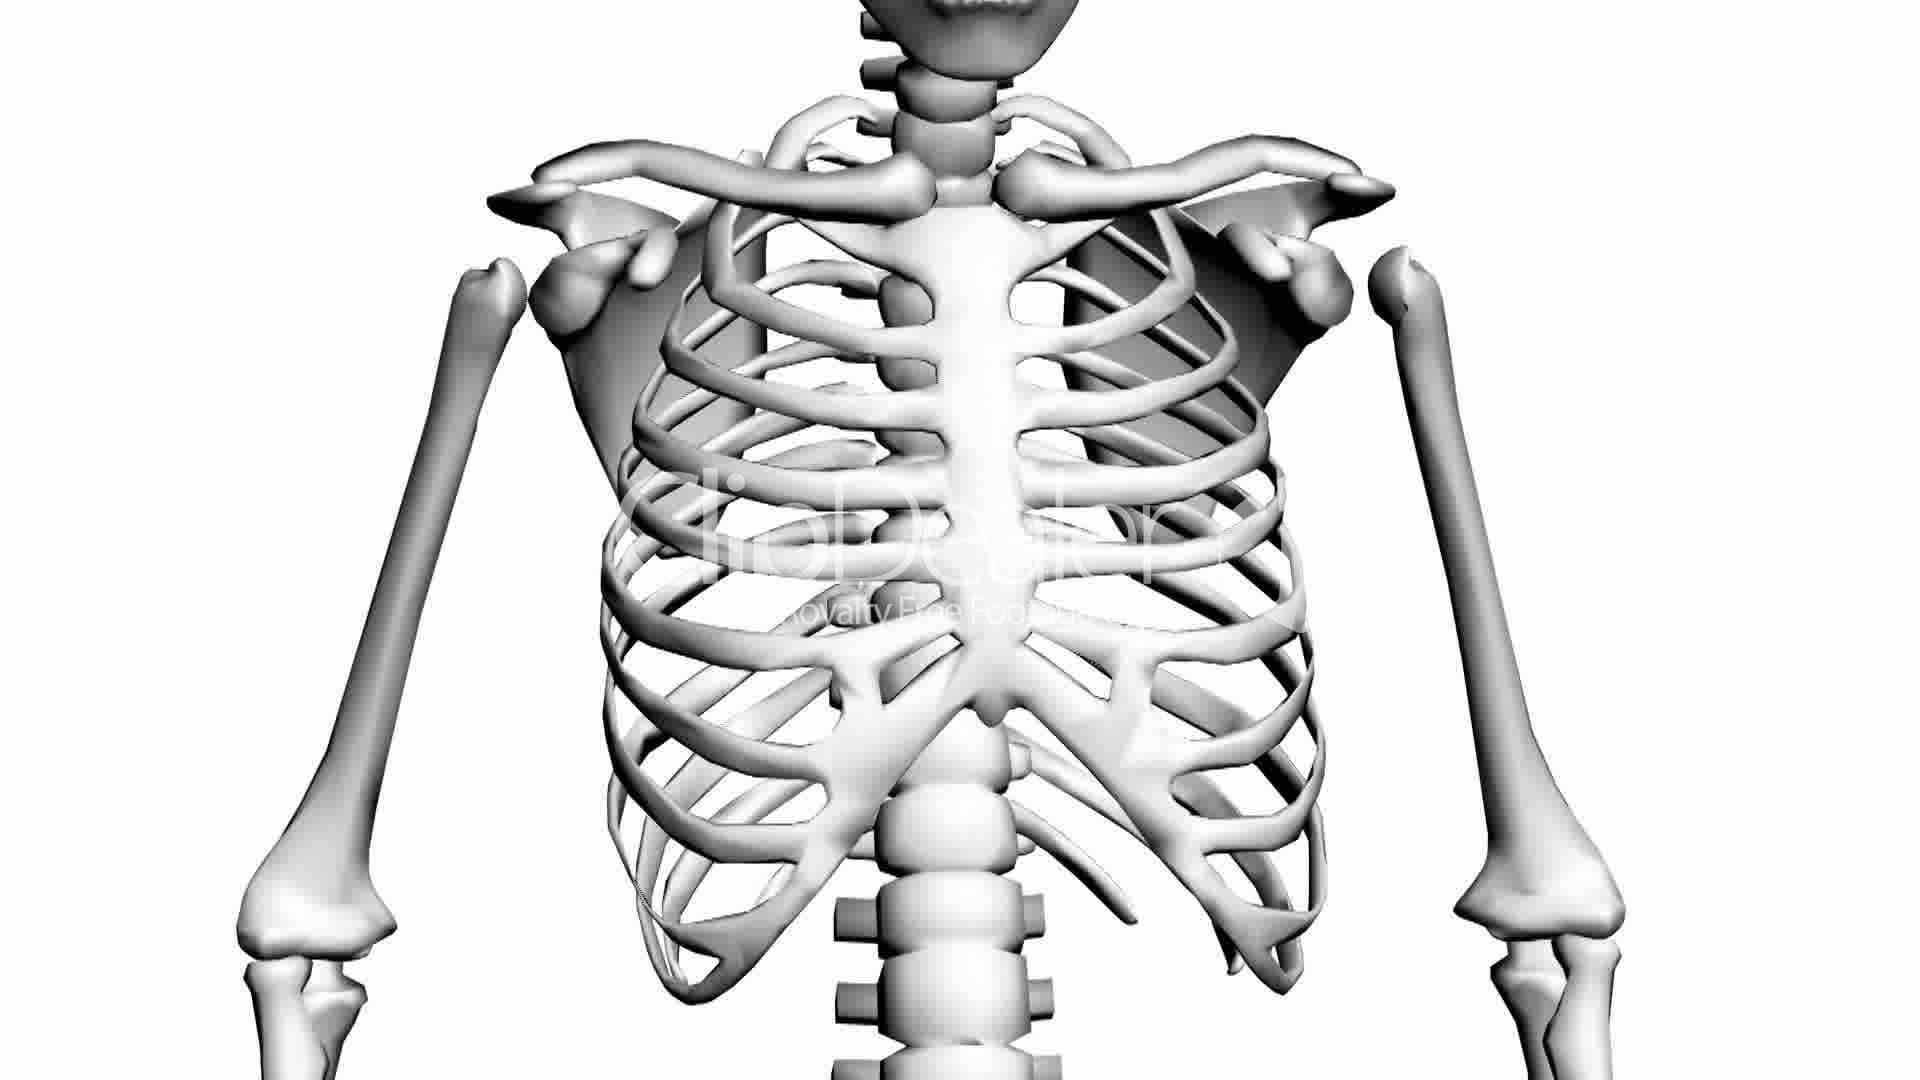 Human Skeleton Drawing At Getdrawings